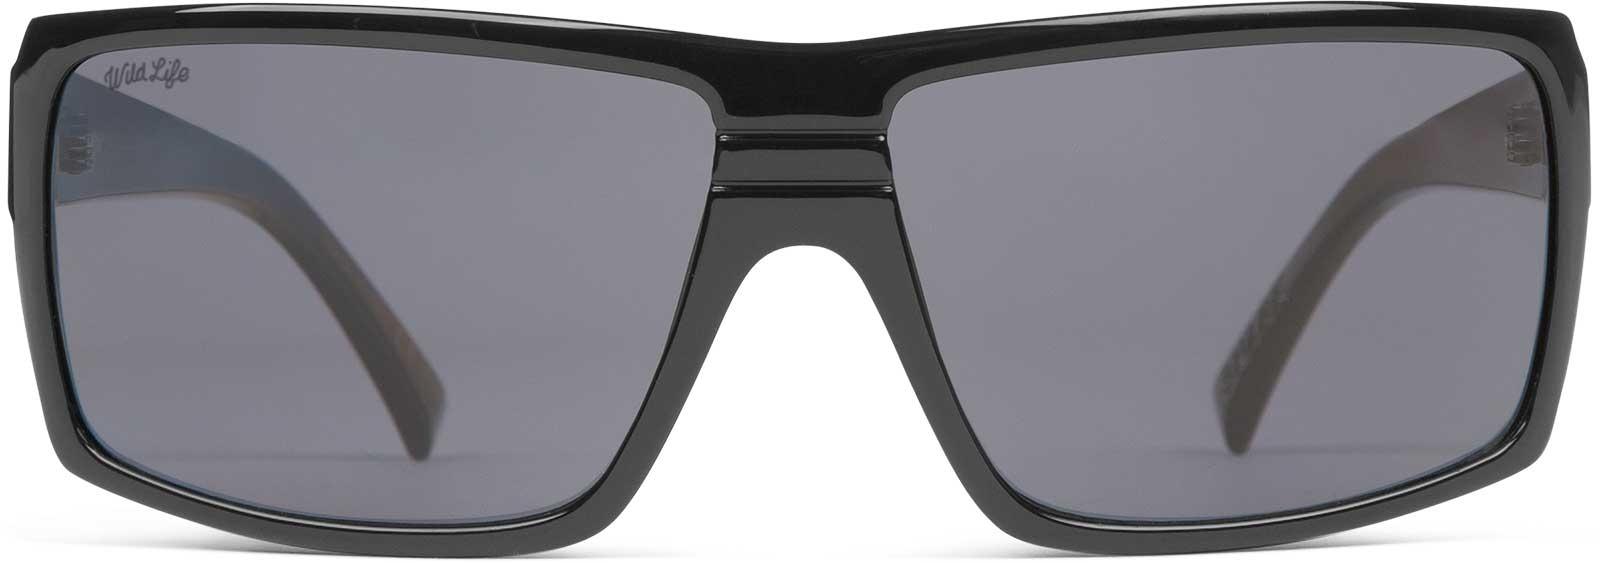 b72f9a2d0e Von Zipper Snark Wildlife Polarized Sunglasses Mens